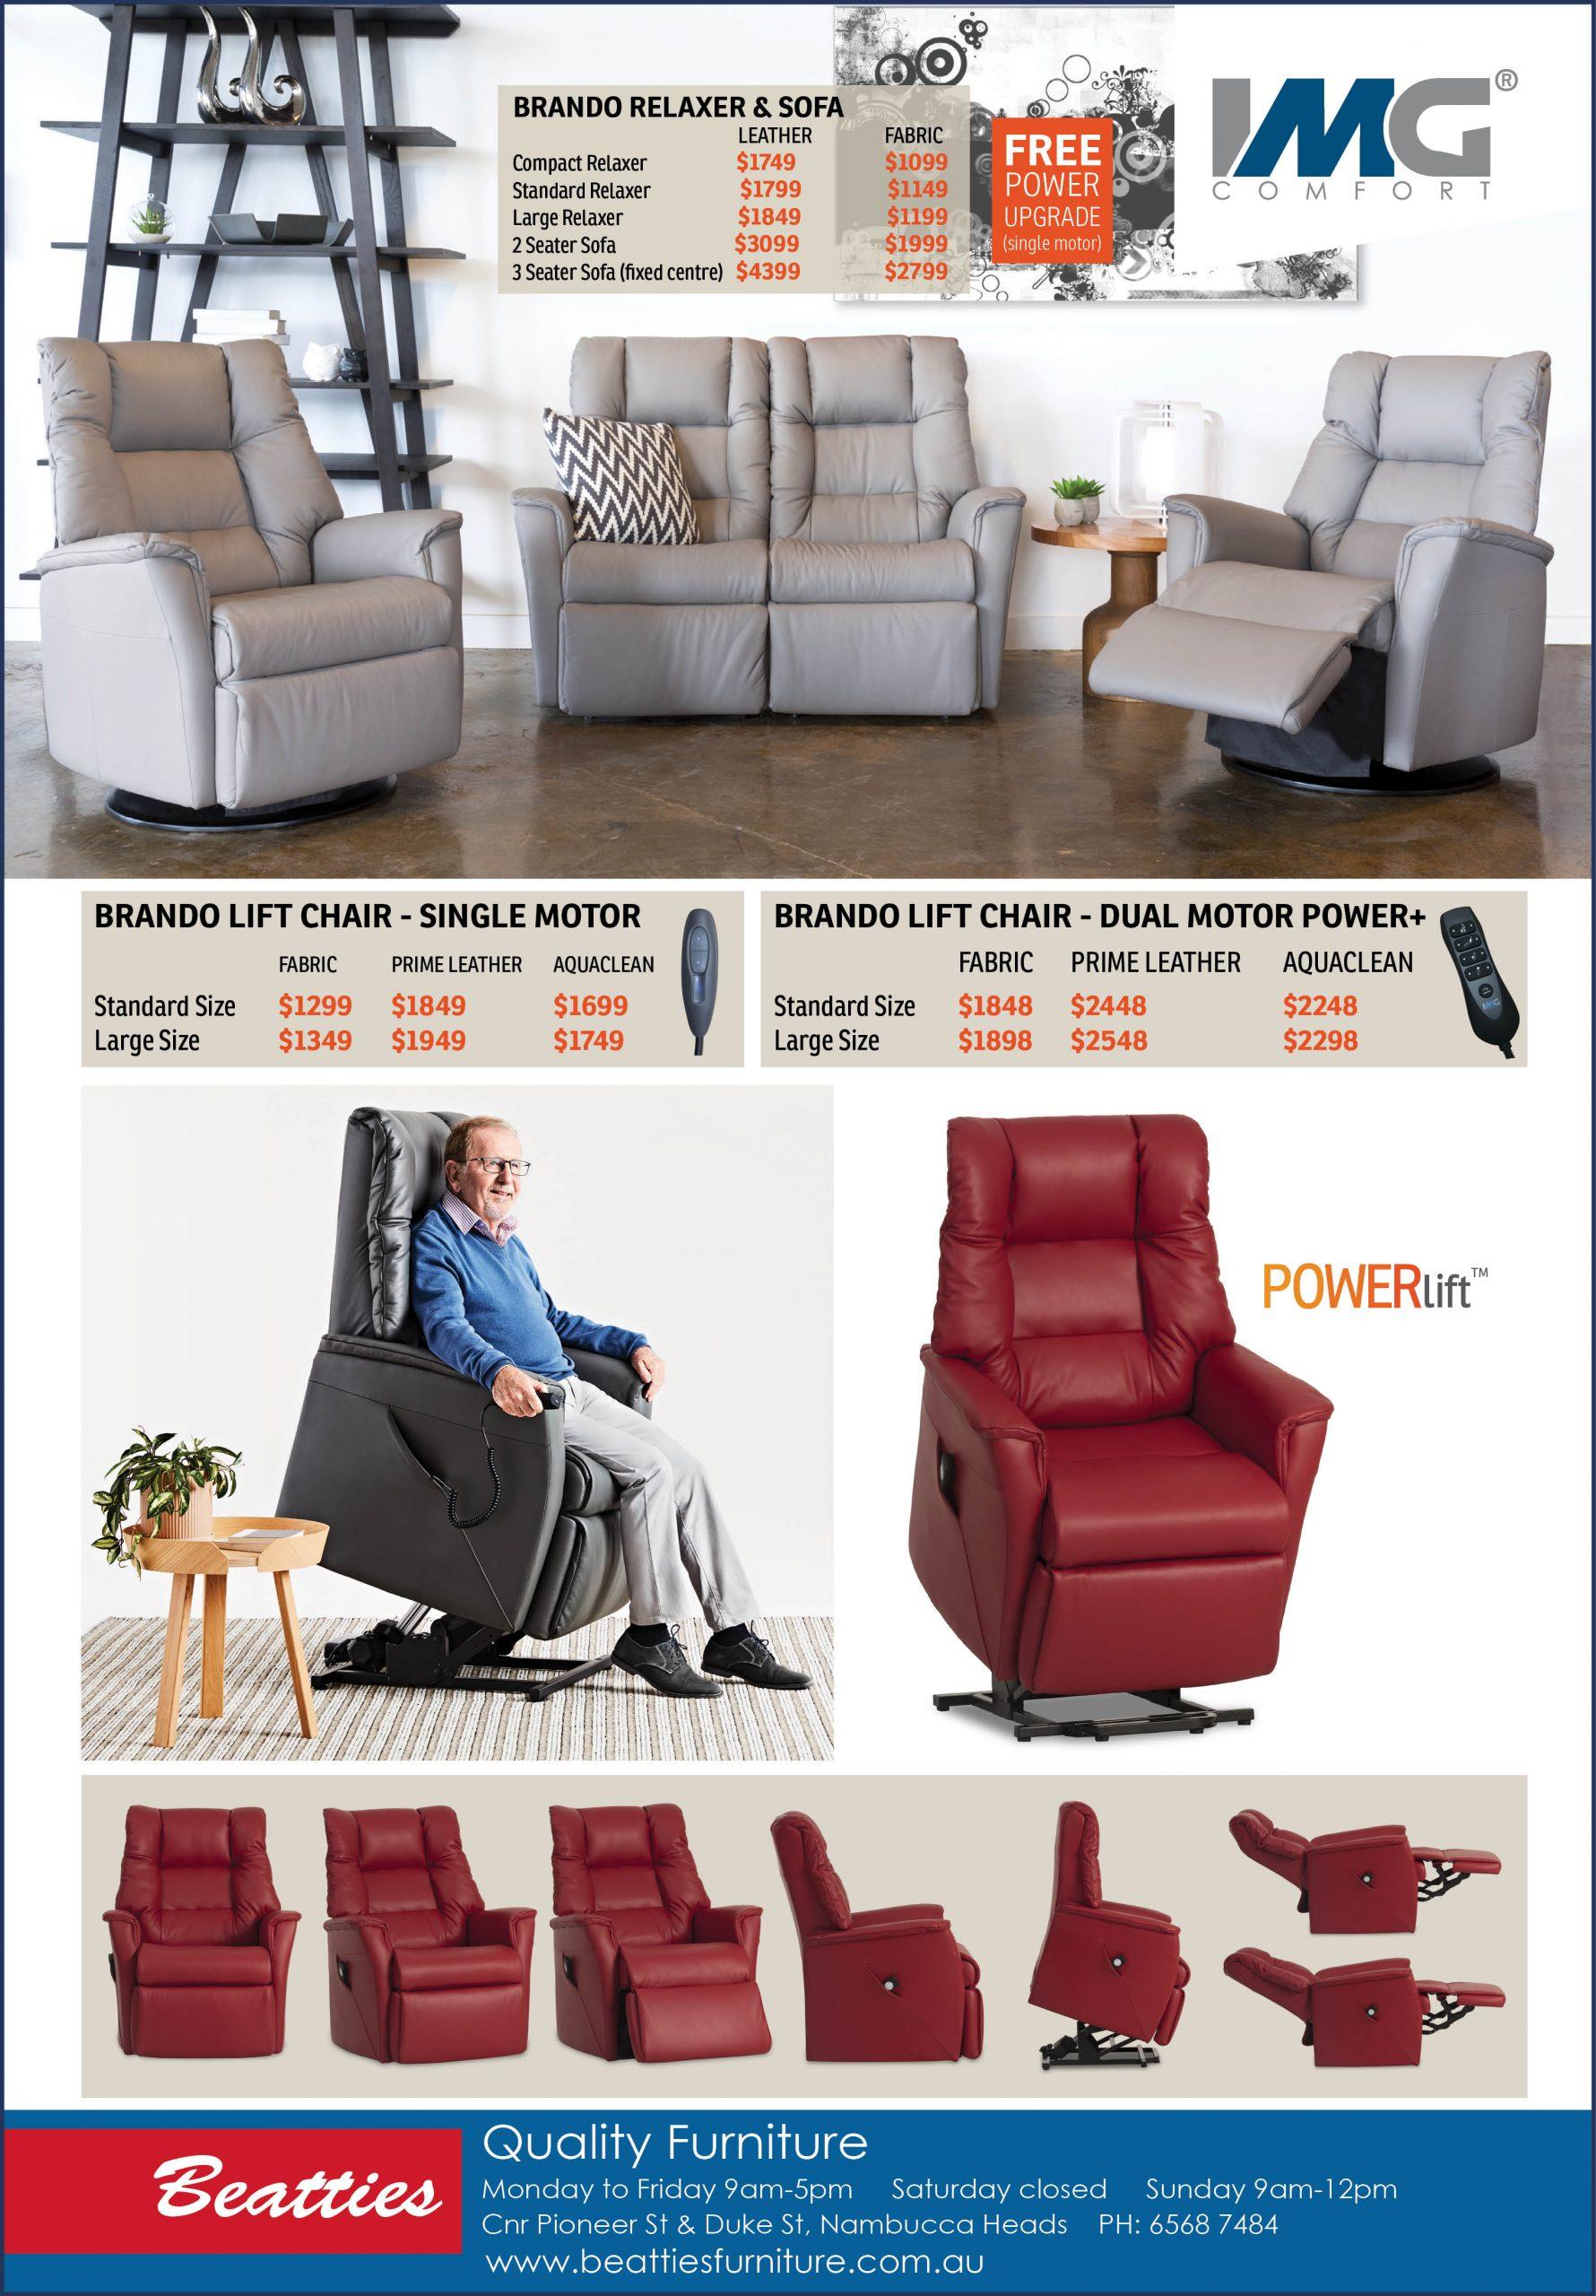 Beatties Furniture